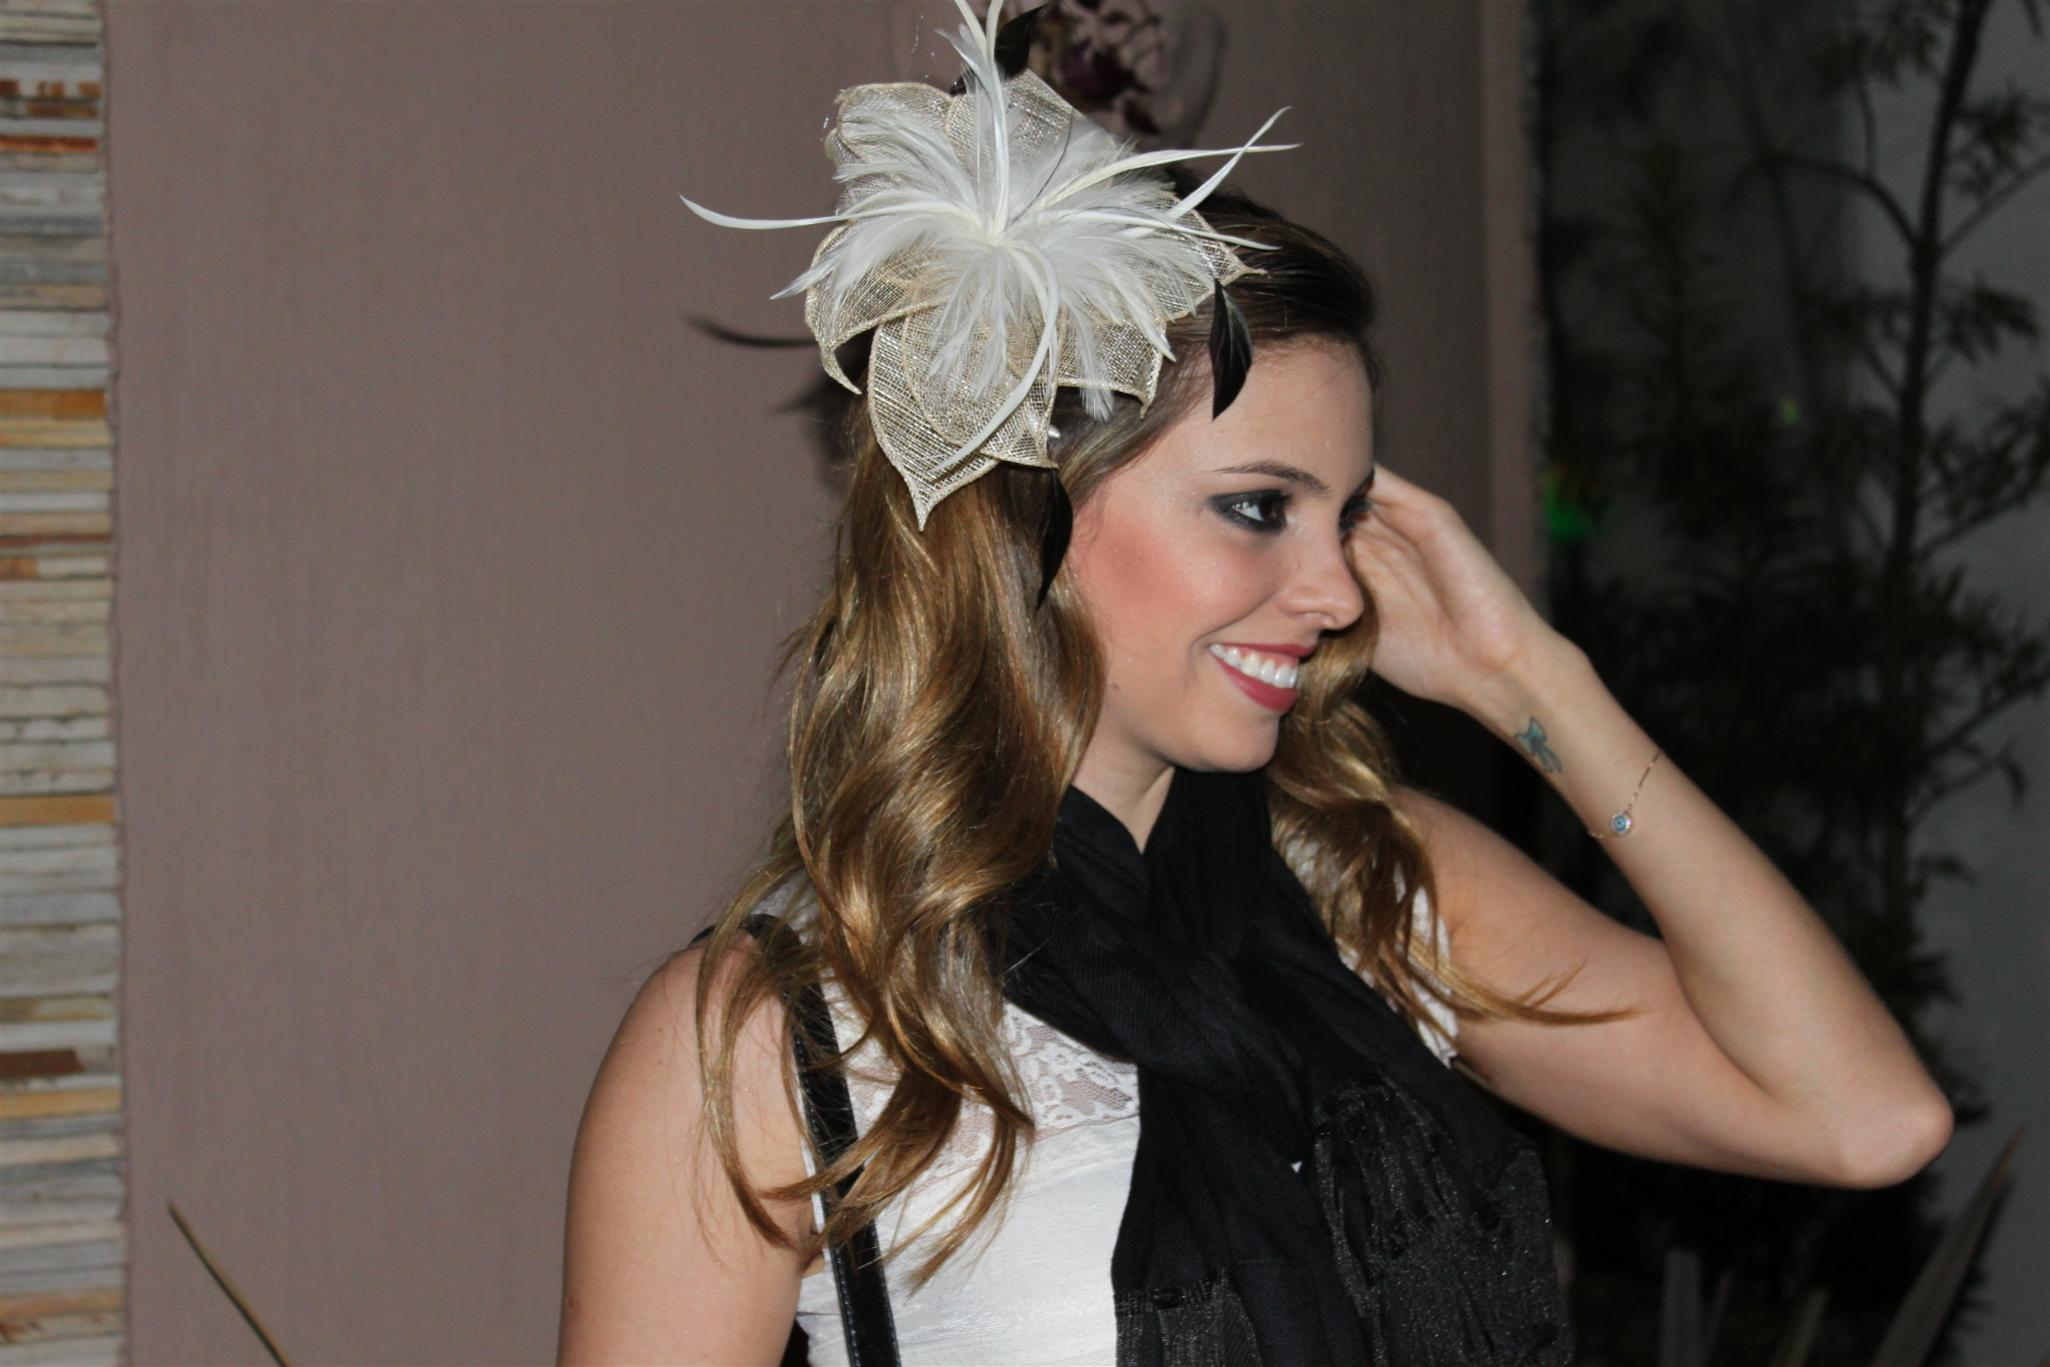 Bolsa De Festa Zara : Look do dia acess?rio pra cabelo sarah le?o